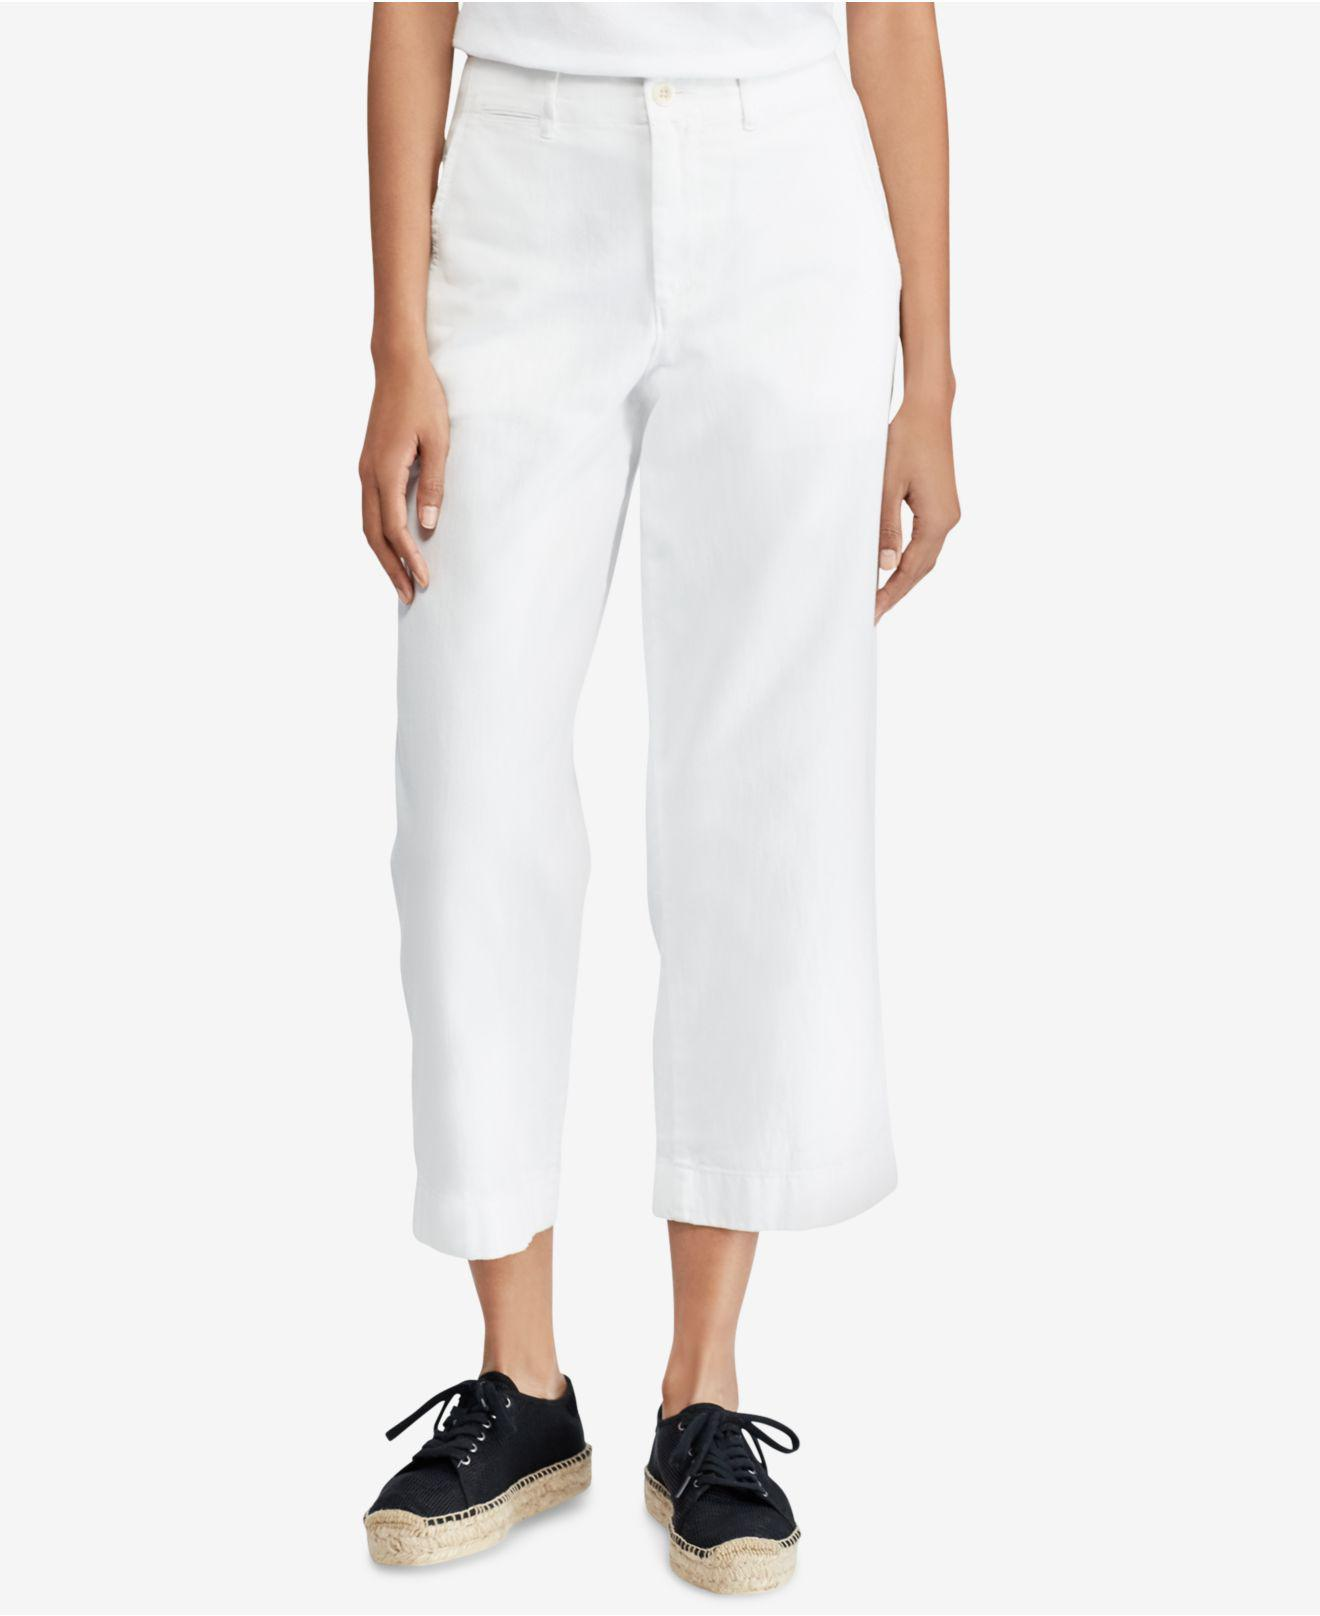 straight-let trousers - White Polo Ralph Lauren C8rTn